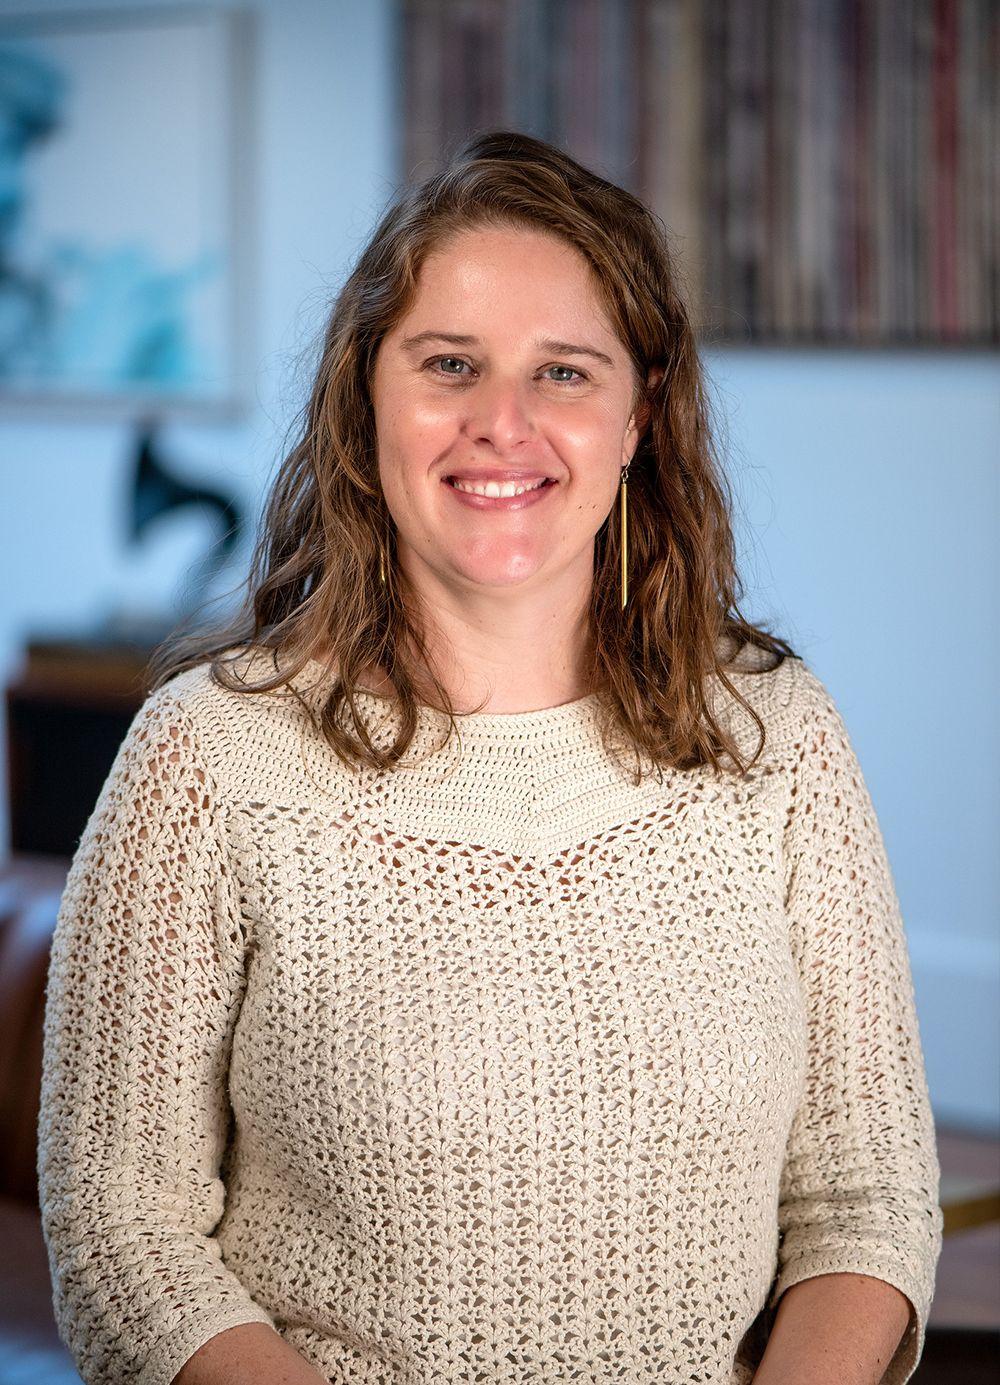 Melissa Bateman